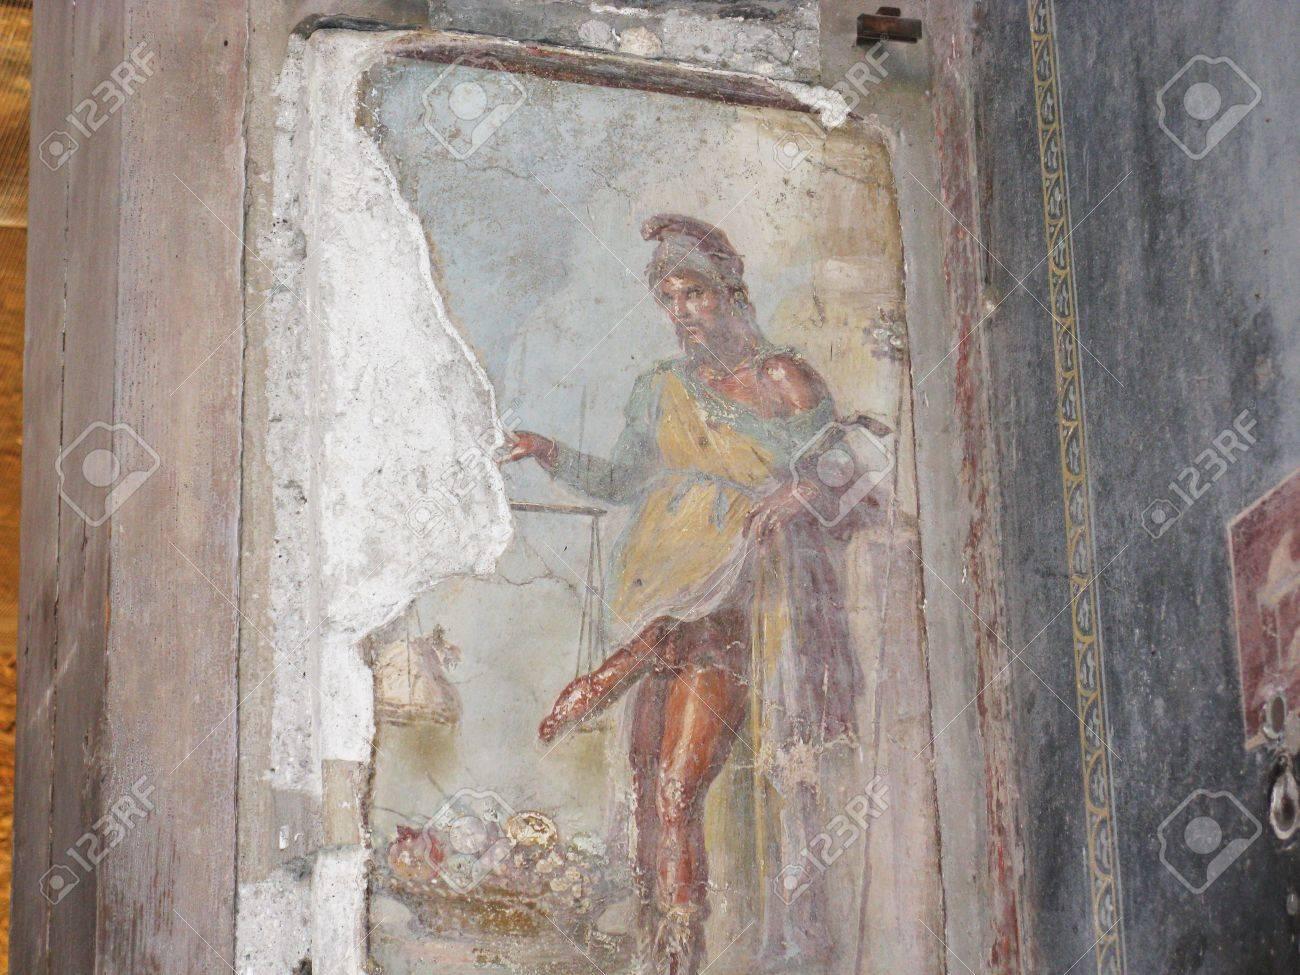 Asshole Excavations Porn pompeii and sex - porno photo